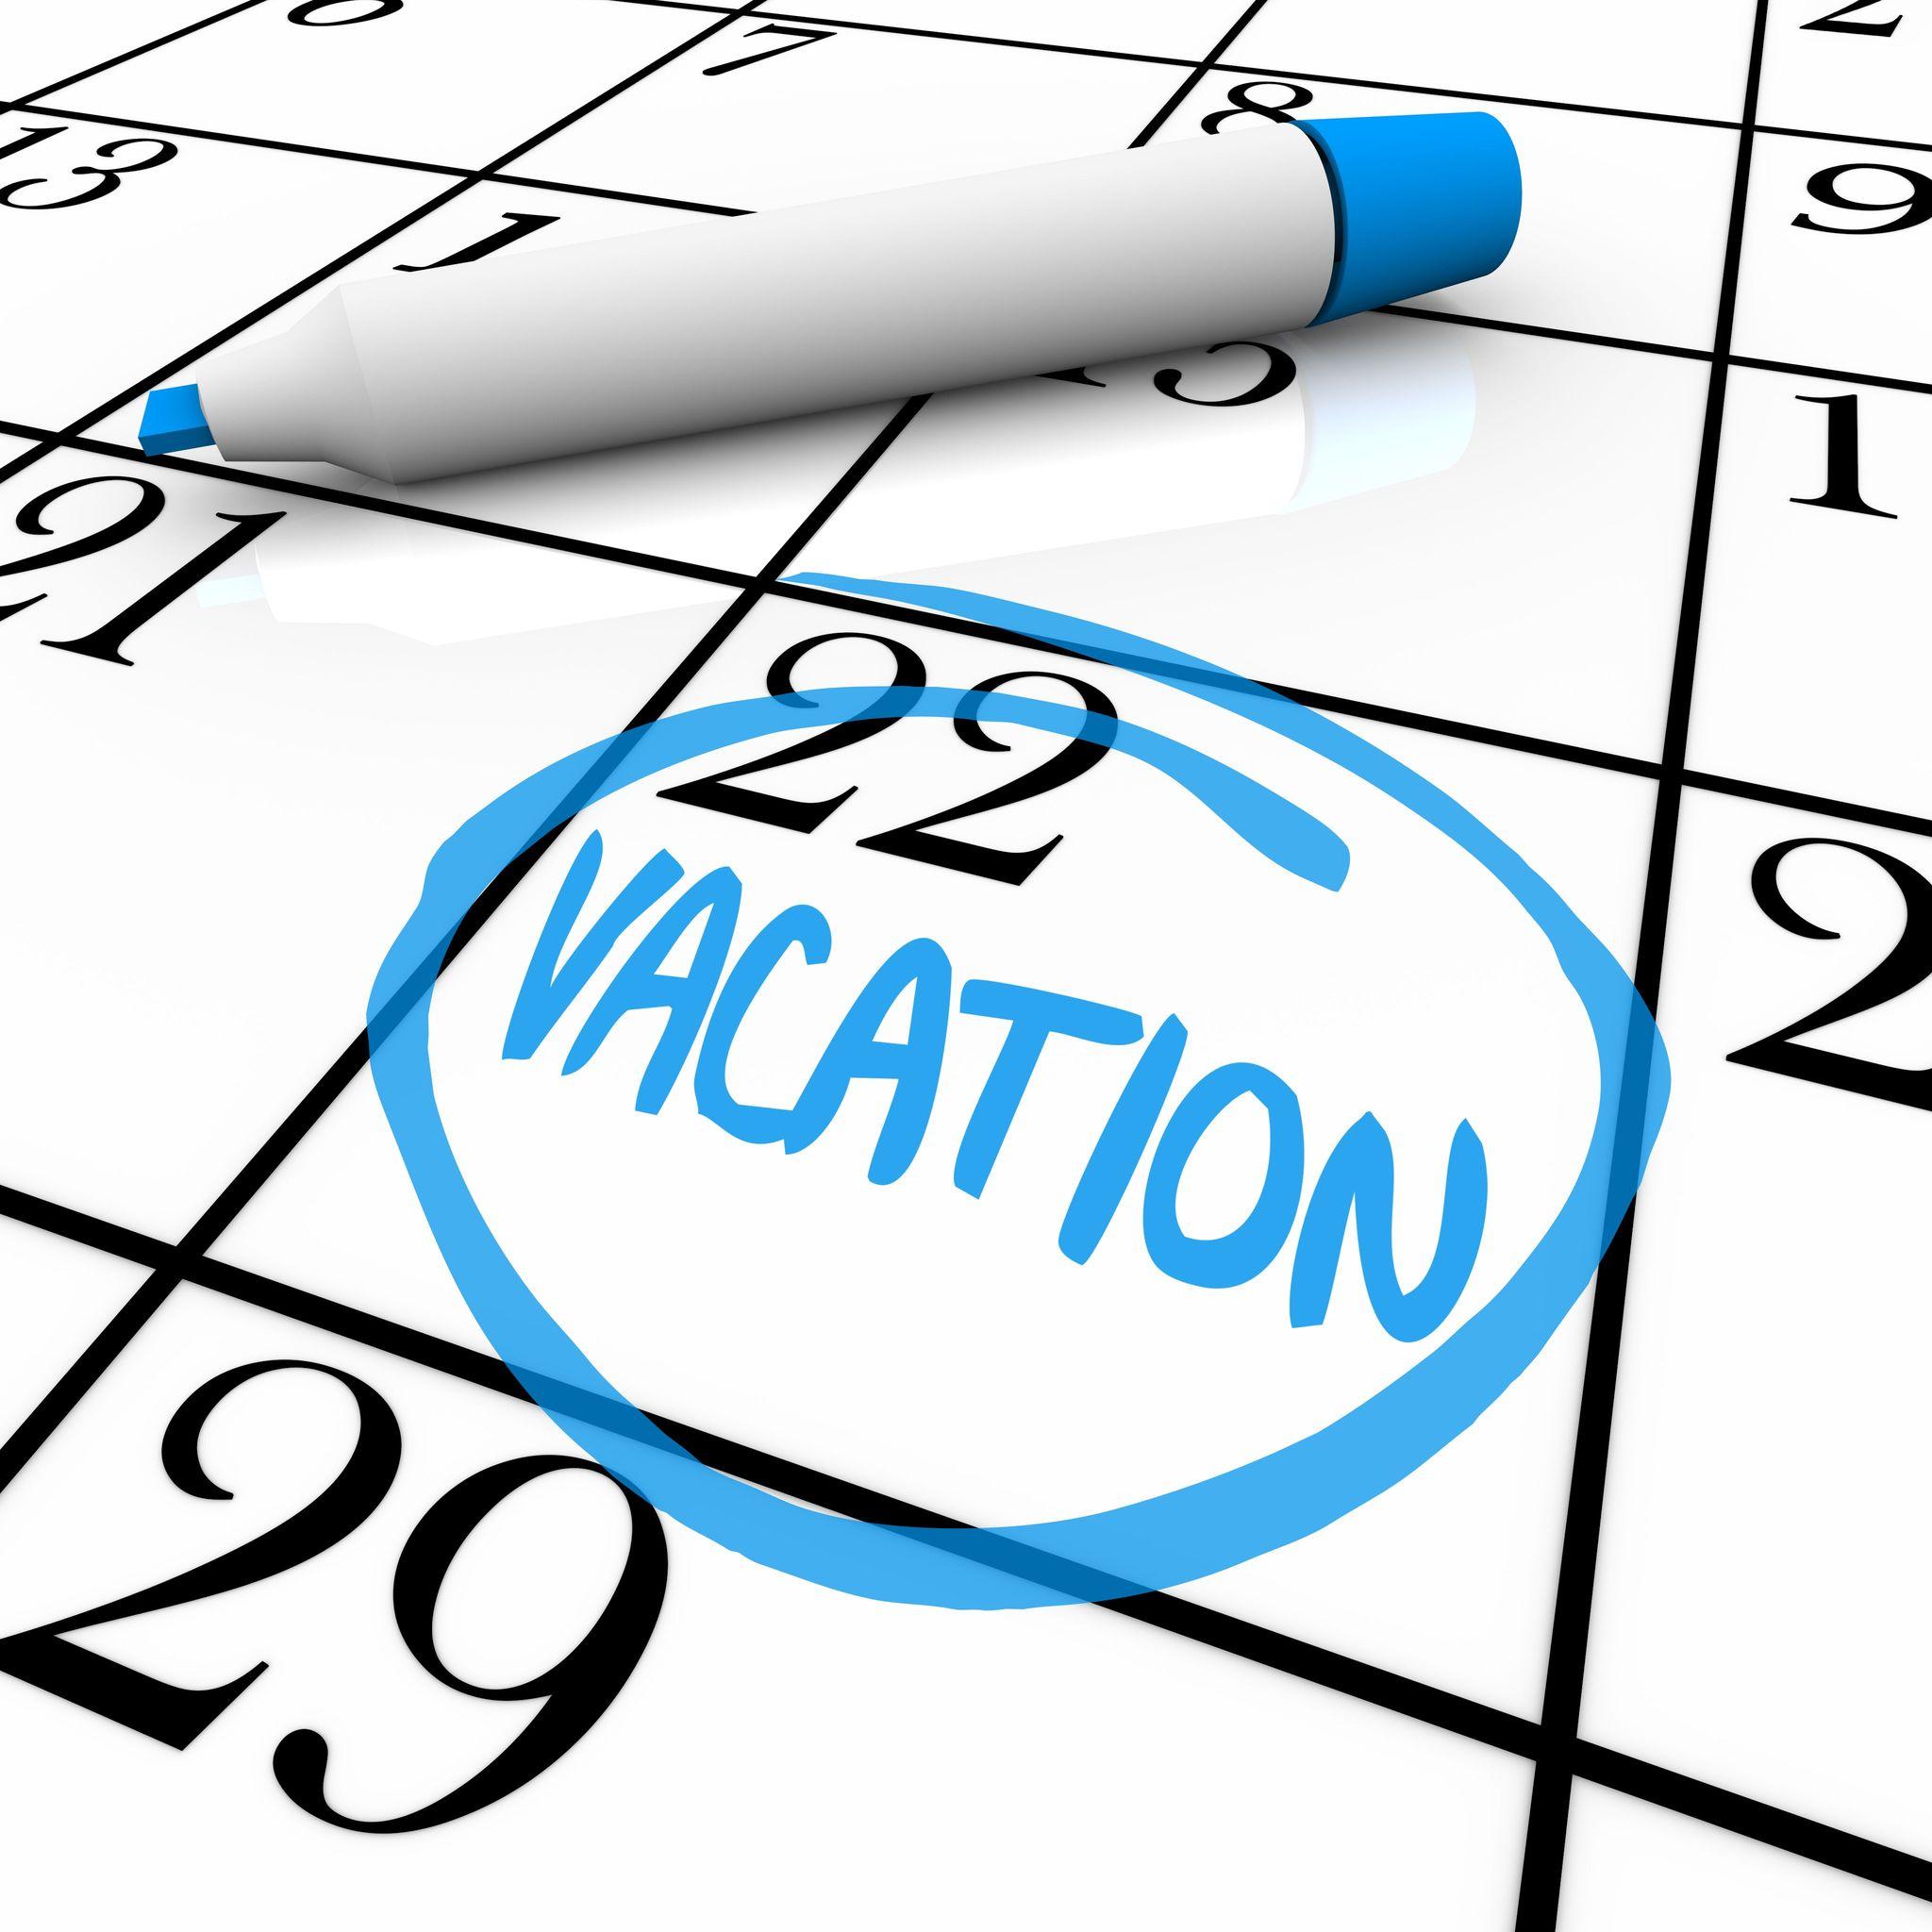 2 week vacation clipart calenda vector transparent download Vacation Dream Makers vector transparent download